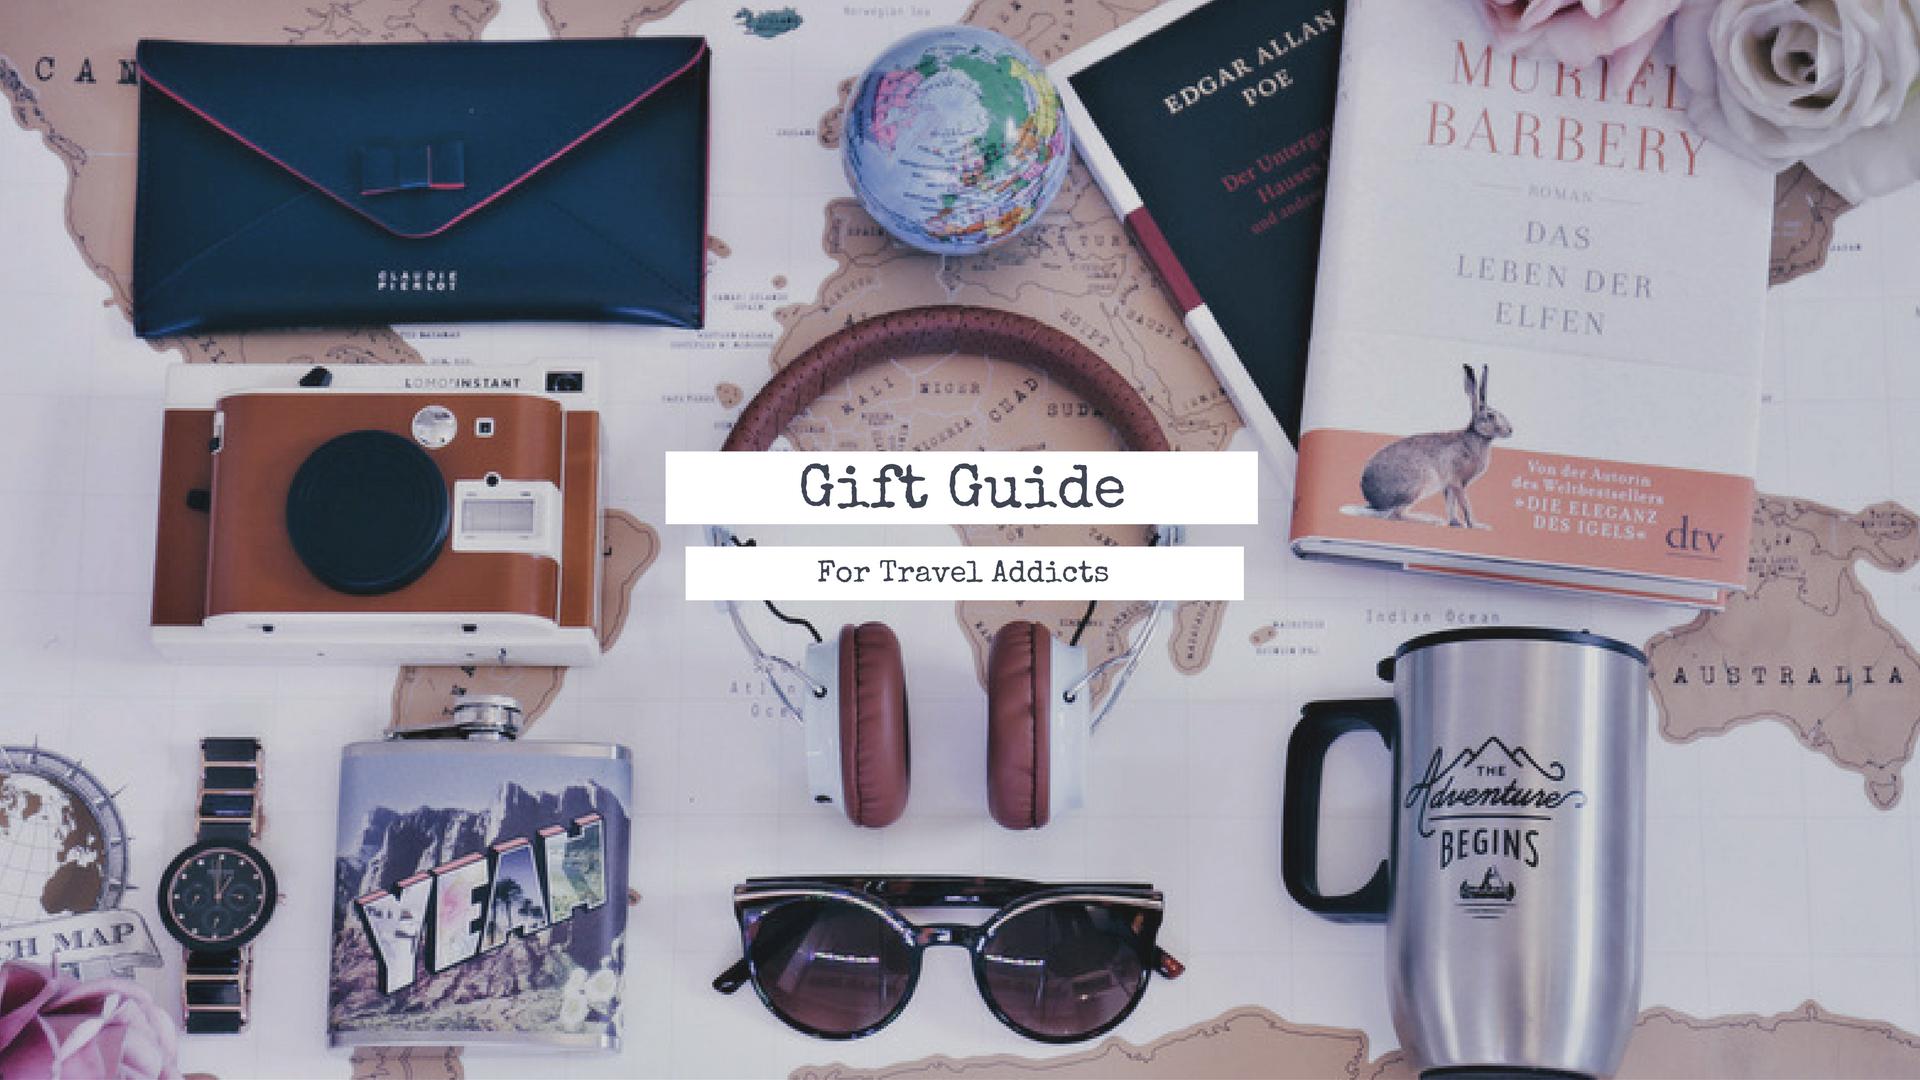 Geschenkideen Reisebegeisterte, Geschenk Ideen für Travel Addicts, Wanderlust Gift Guide, Geschenke für Reisende, Reise Geschenkideen, Gift Guide for Travel Addicts, Like A Riot, Lifestyle Blog